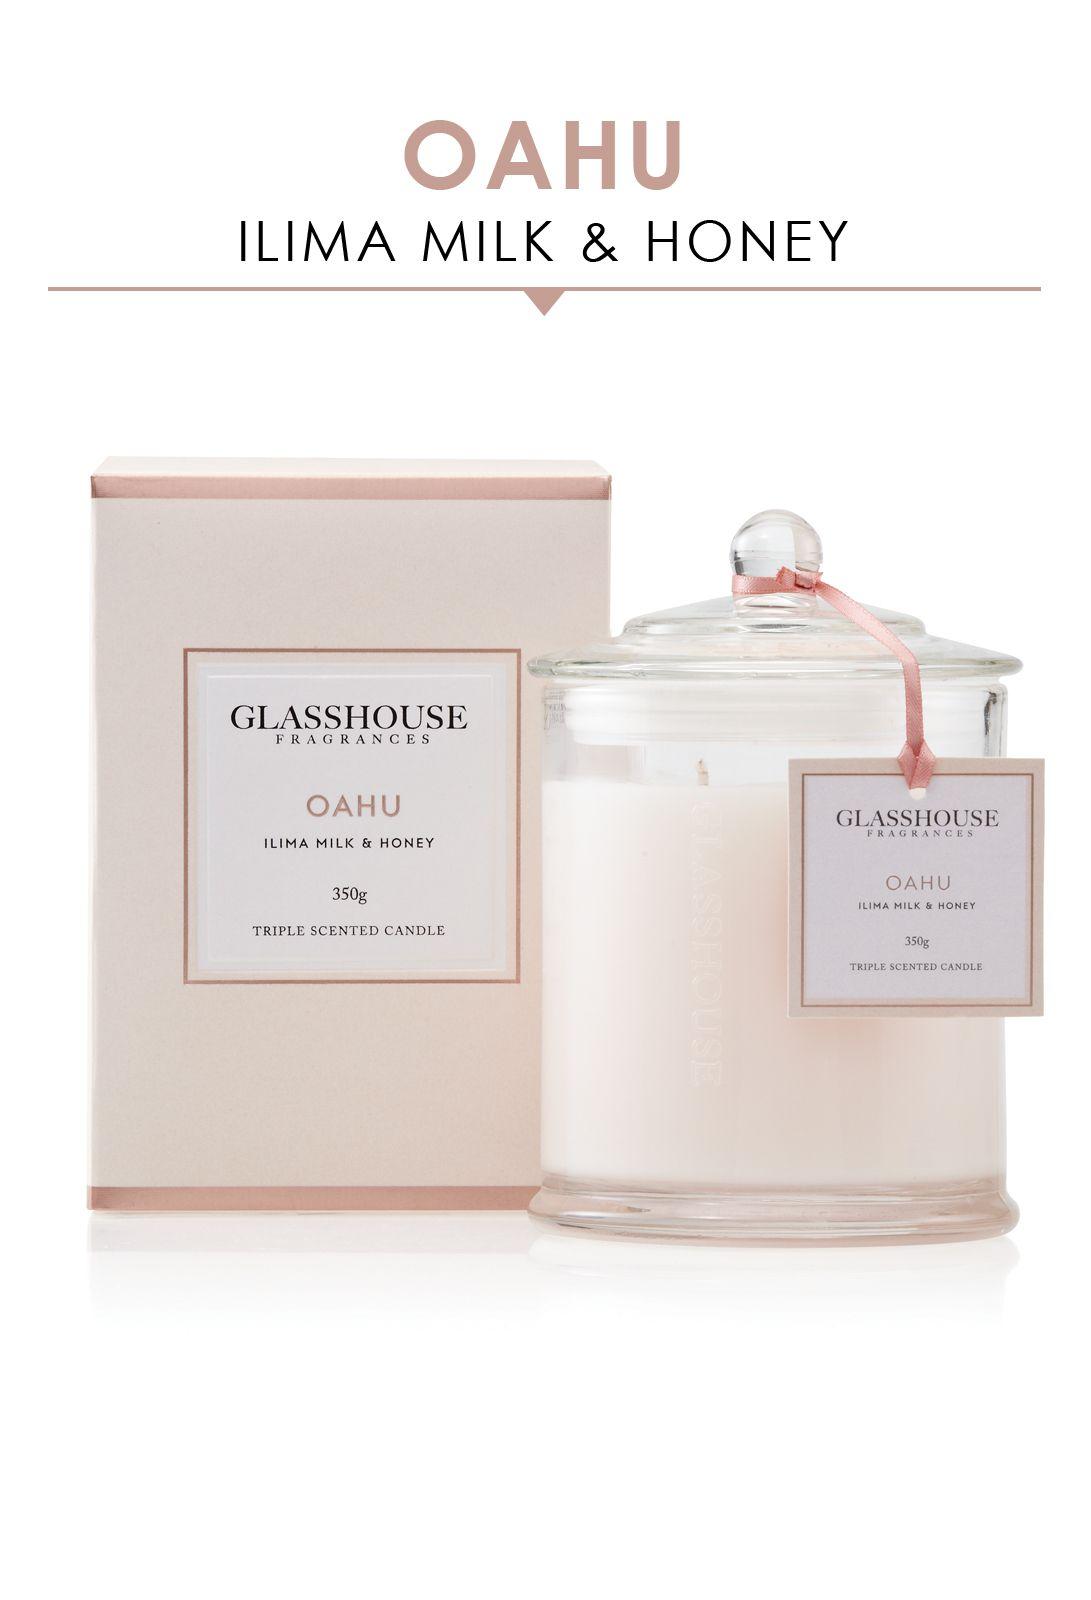 Glasshouse Fragrances Oahu Candle